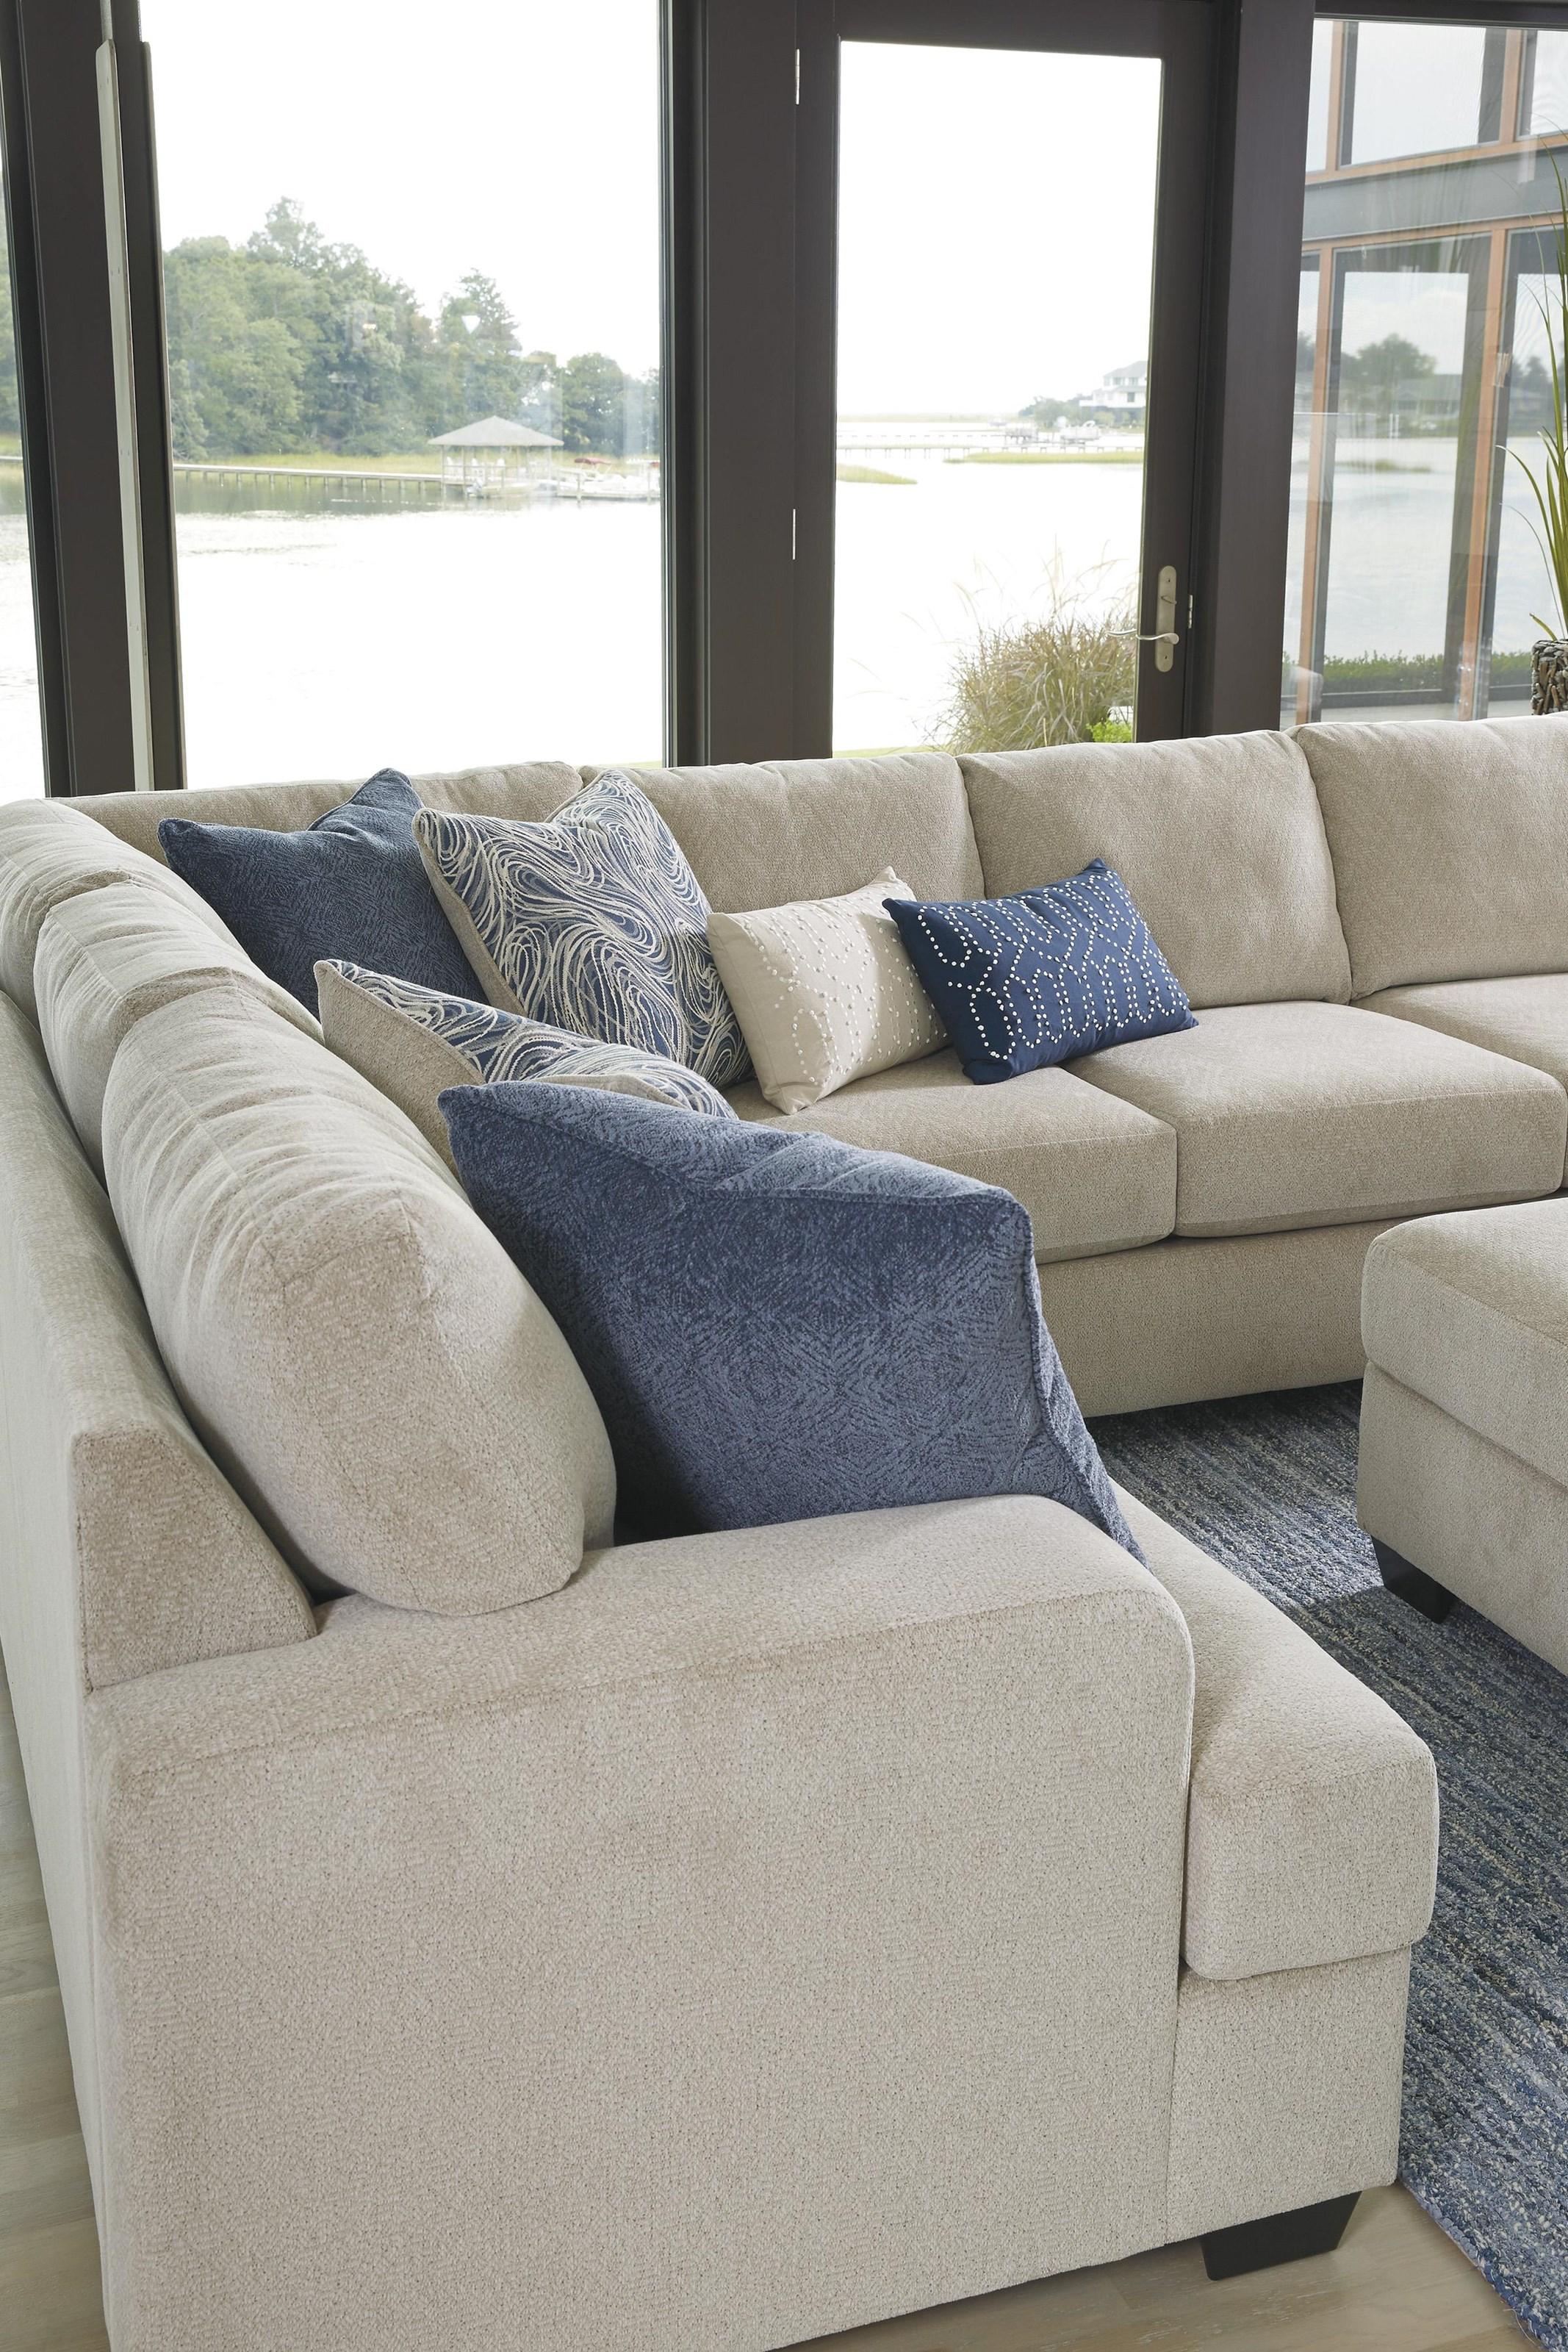 Enola 4 Piece Sectional Sofa by Ashley Furniture at Sam Levitz Furniture